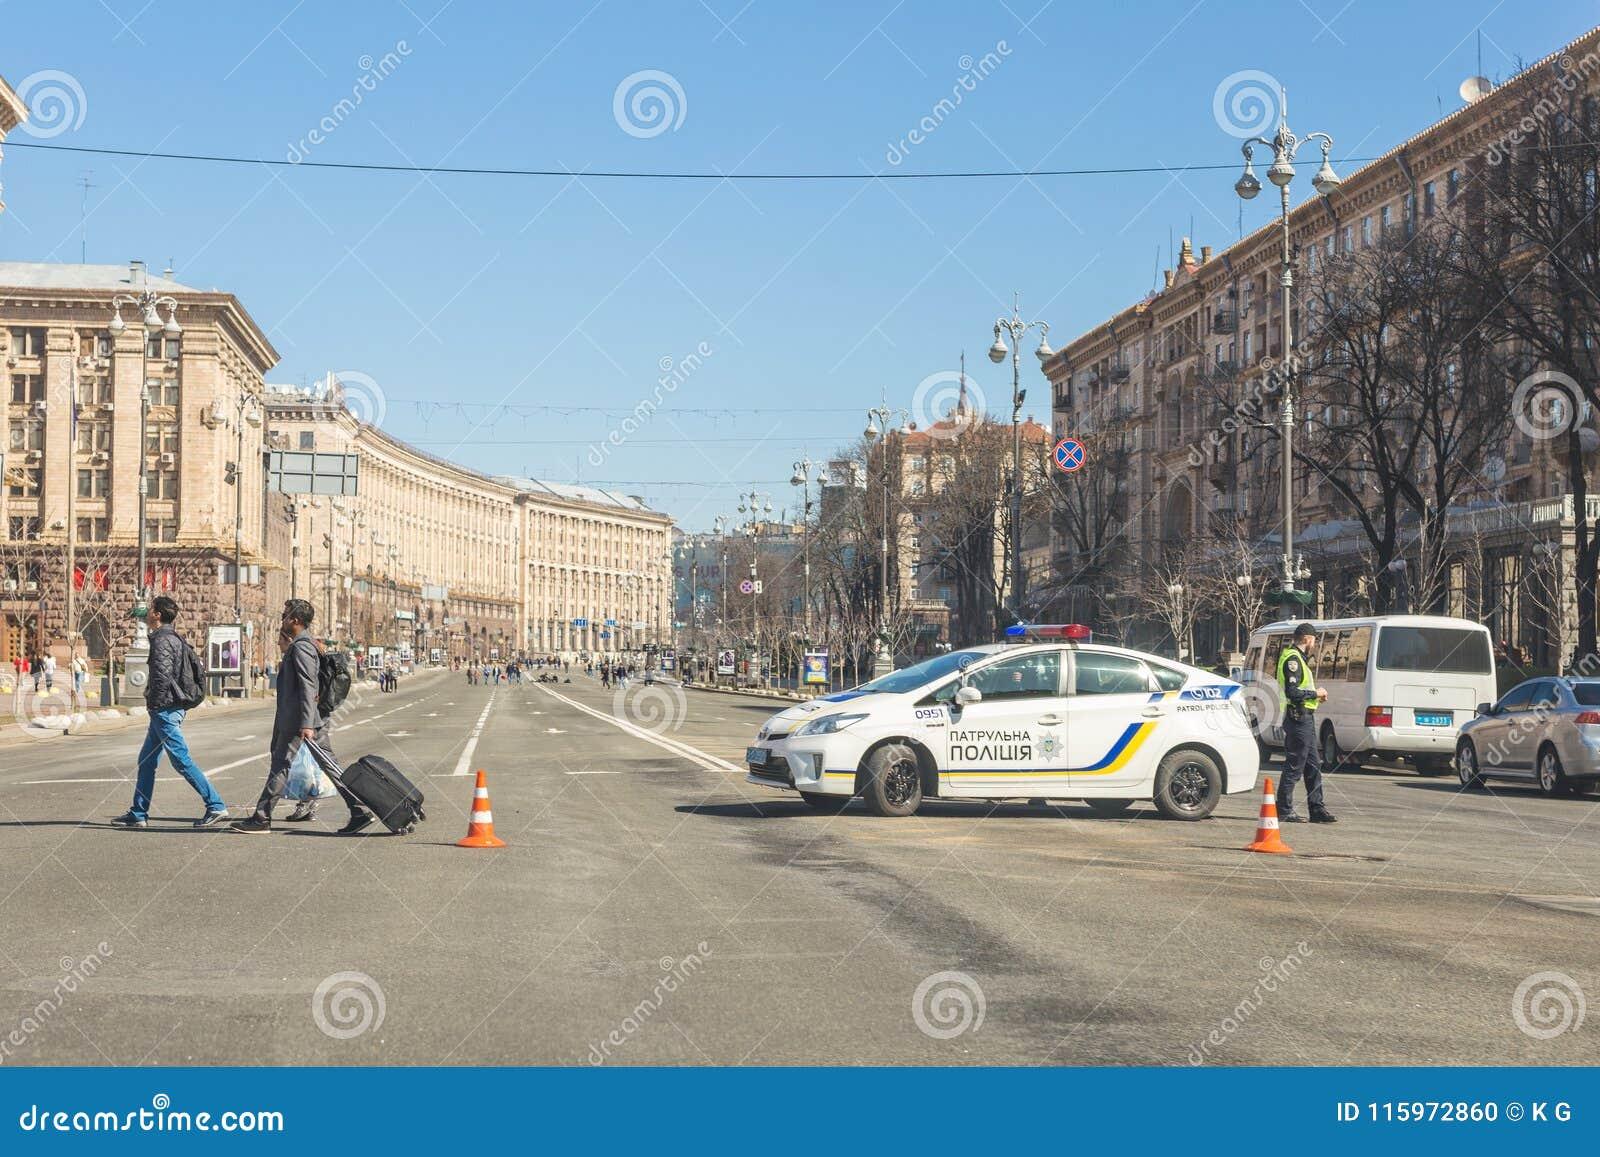 Kiev,Ukraine - May 06, 2017:Central street of ukrainian capital Kyiv Khreschatyk closed for traffic by police car and